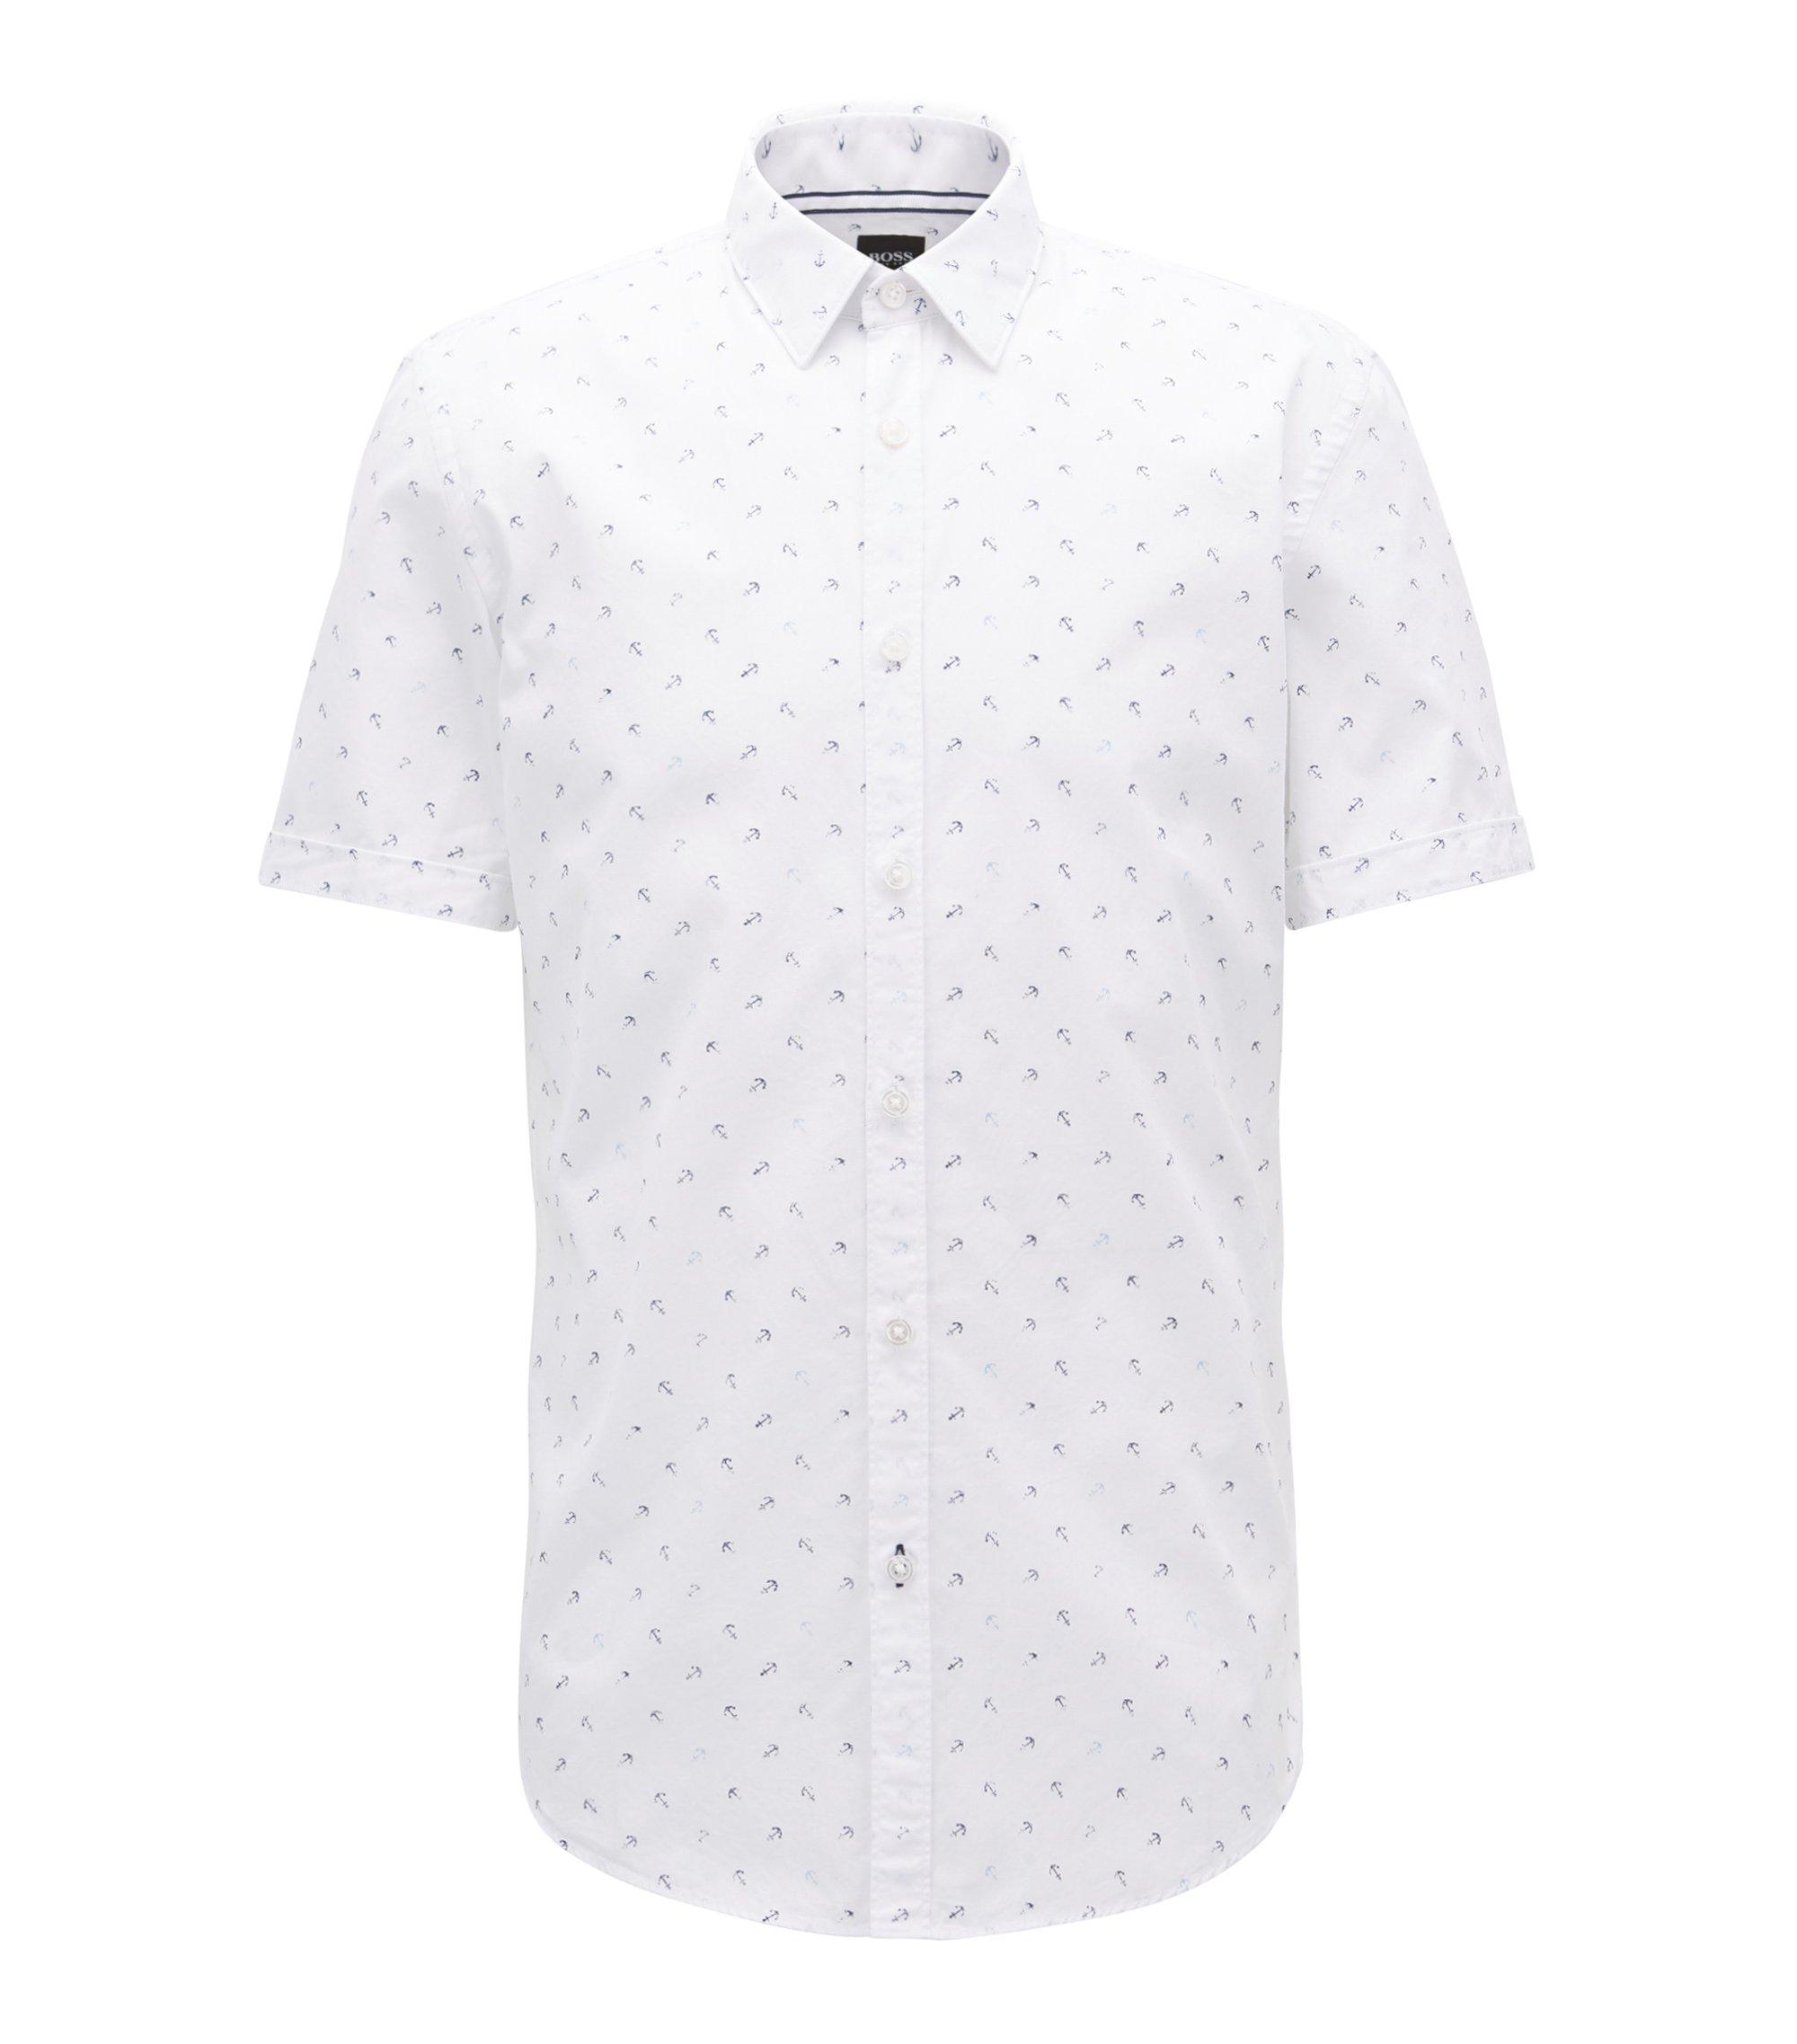 Anchor-Print Sport Shirt, Slim Fit | Ronn, Light Blue